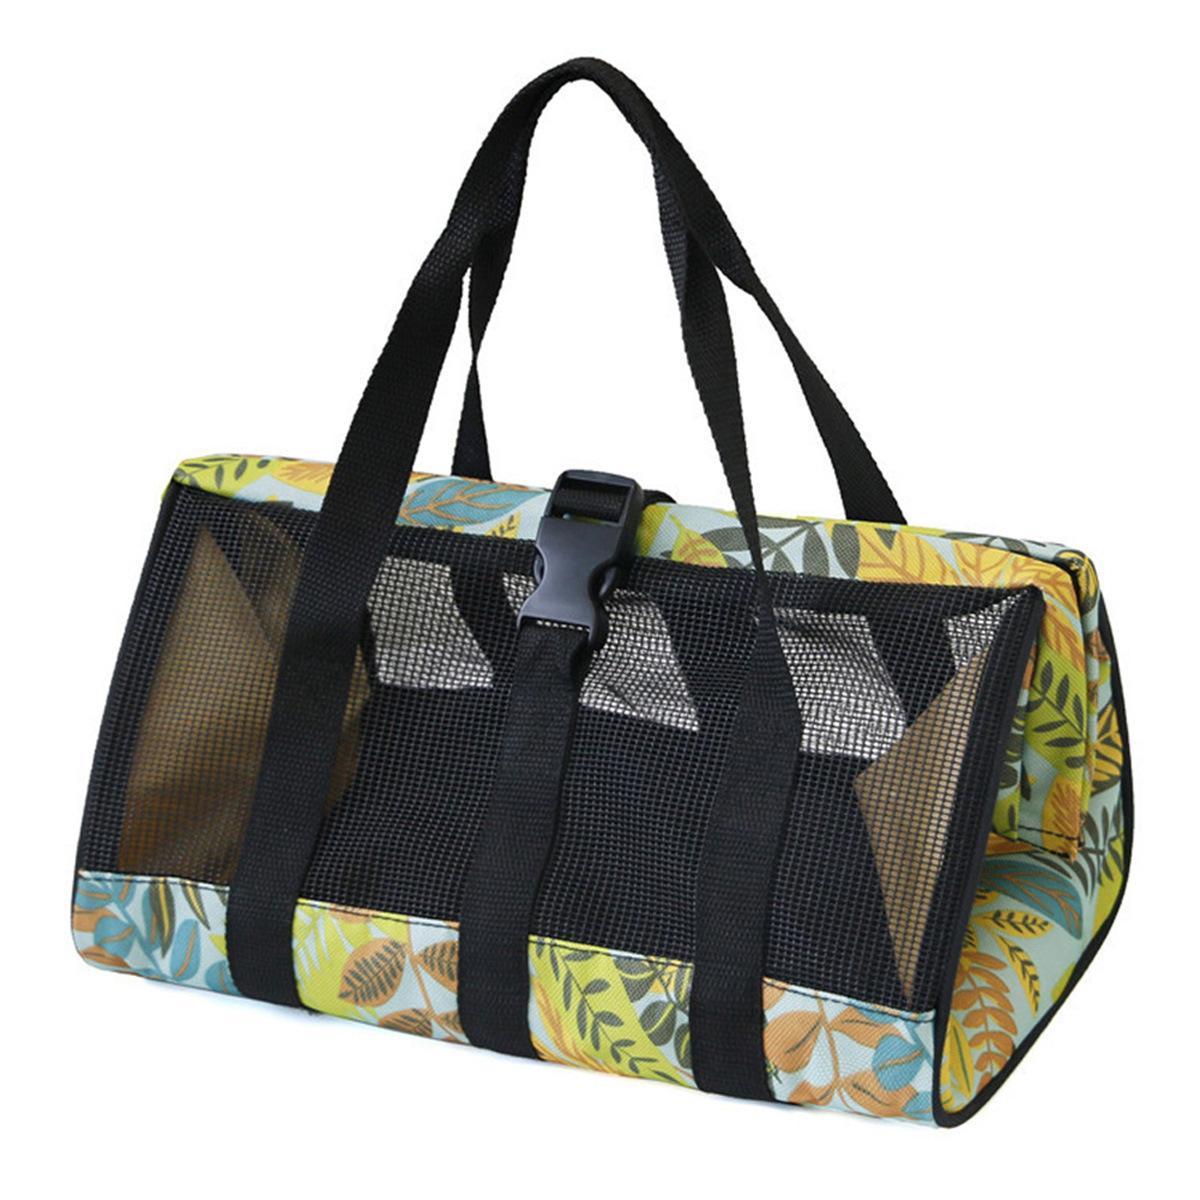 600D手提收纳包牛津布园艺工具袋 帆布网眼手提袋 运动健身收纳包